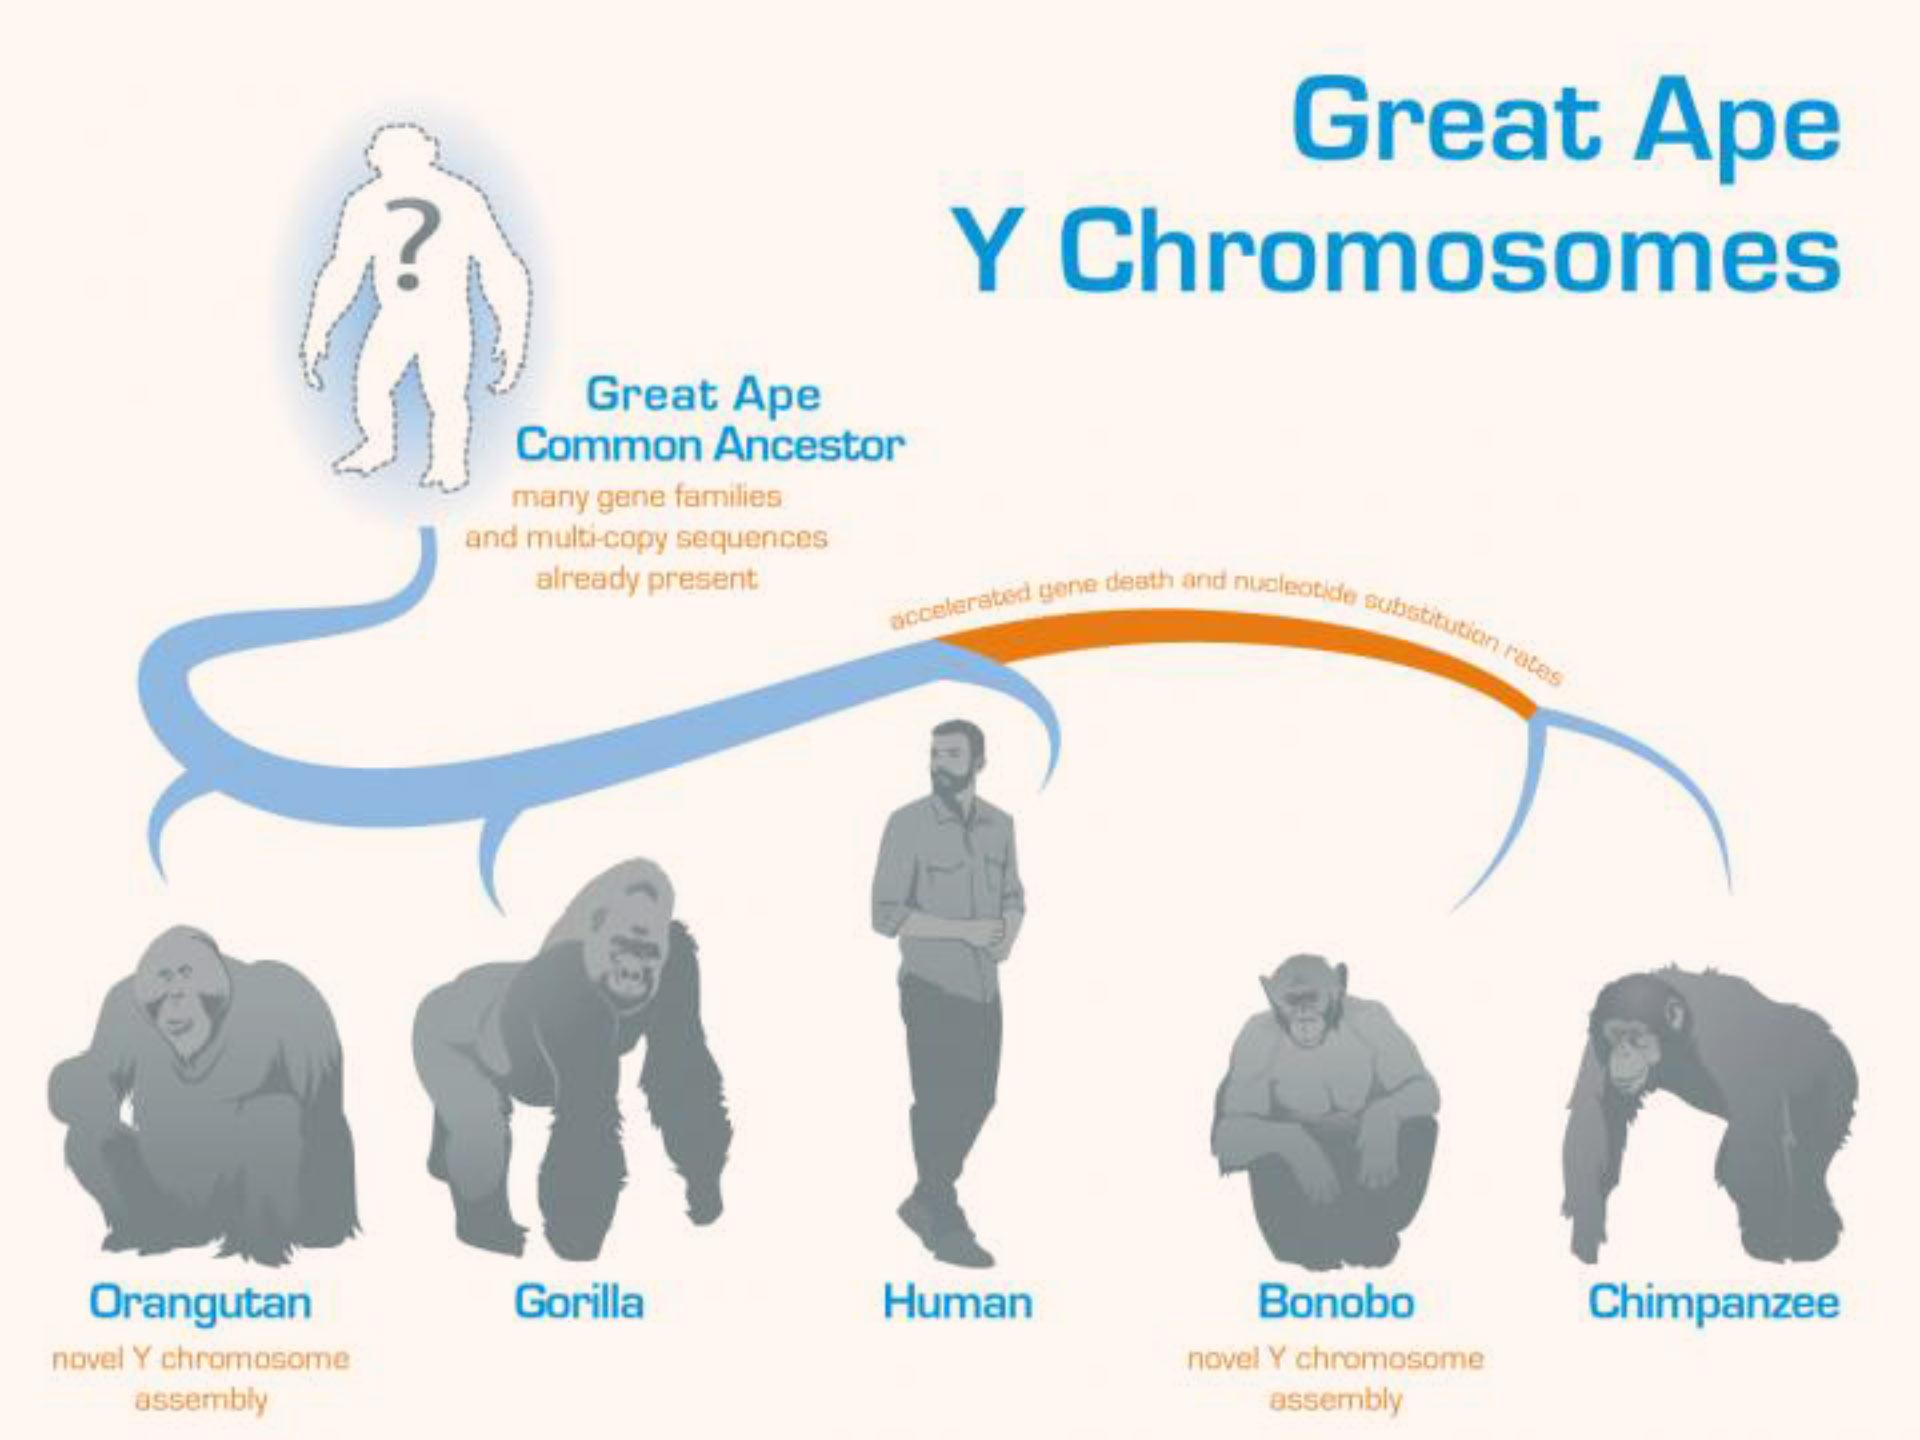 image e Great Ape Y Chromosomes